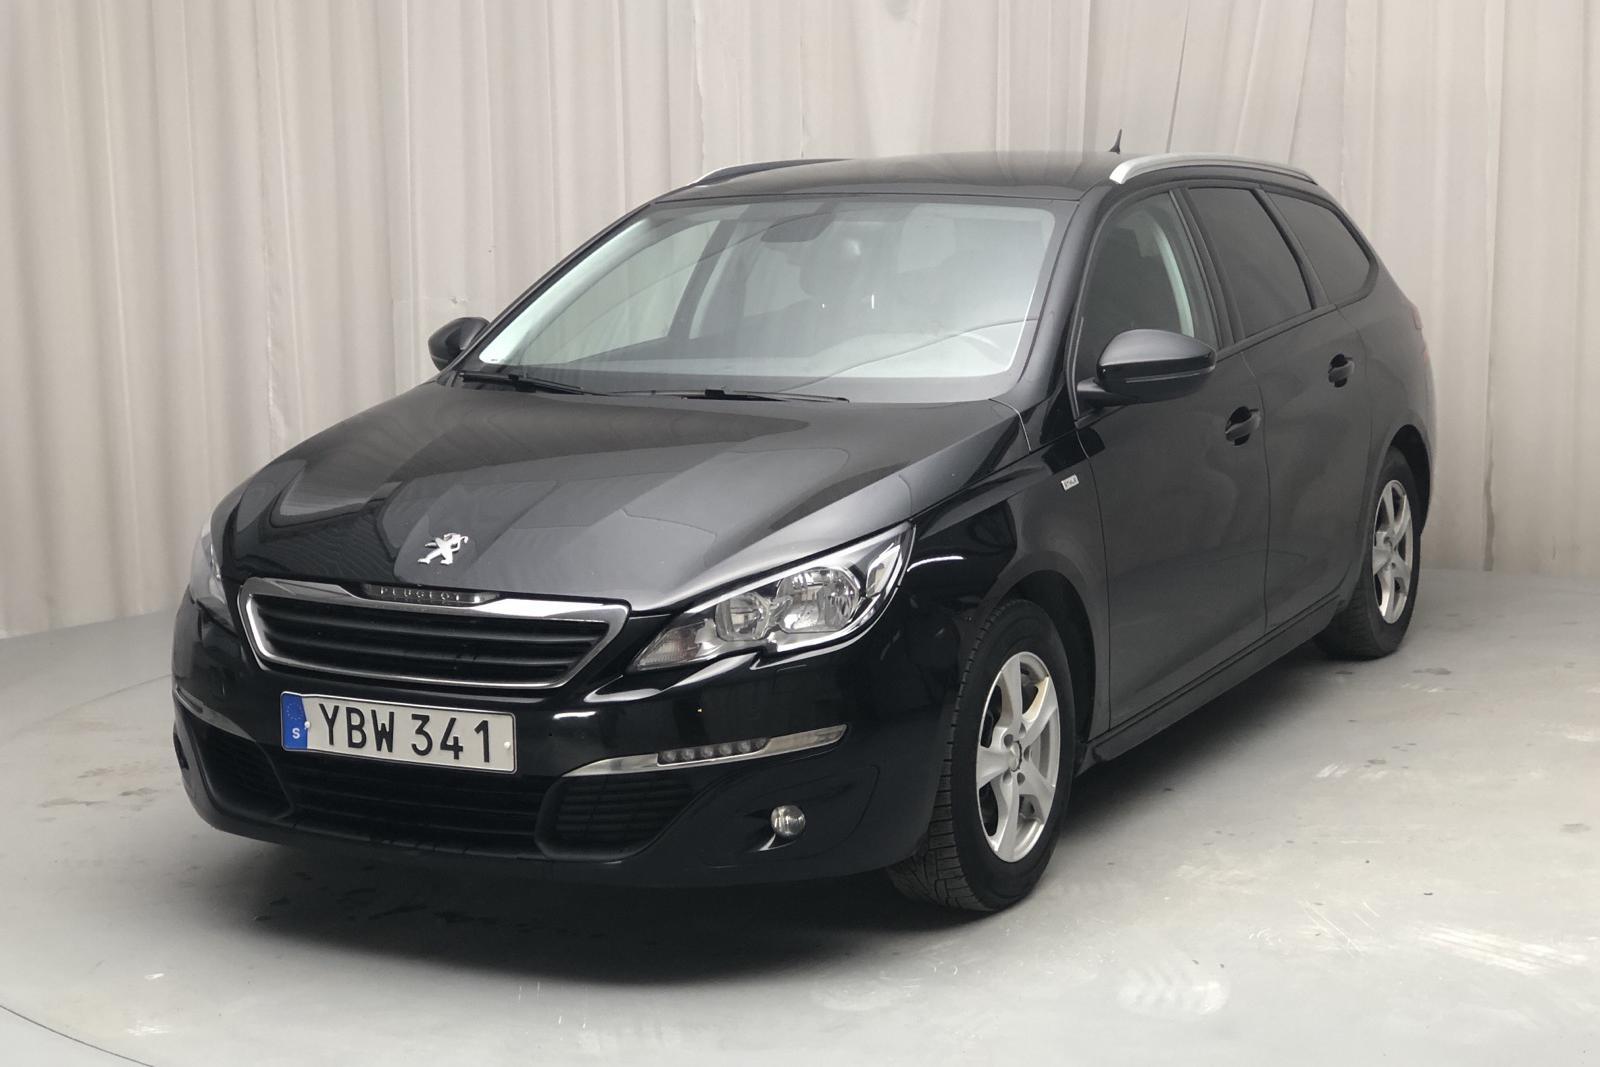 Peugeot 308 SW PureTech (130hk) - 147 470 km - Manual - black - 2016